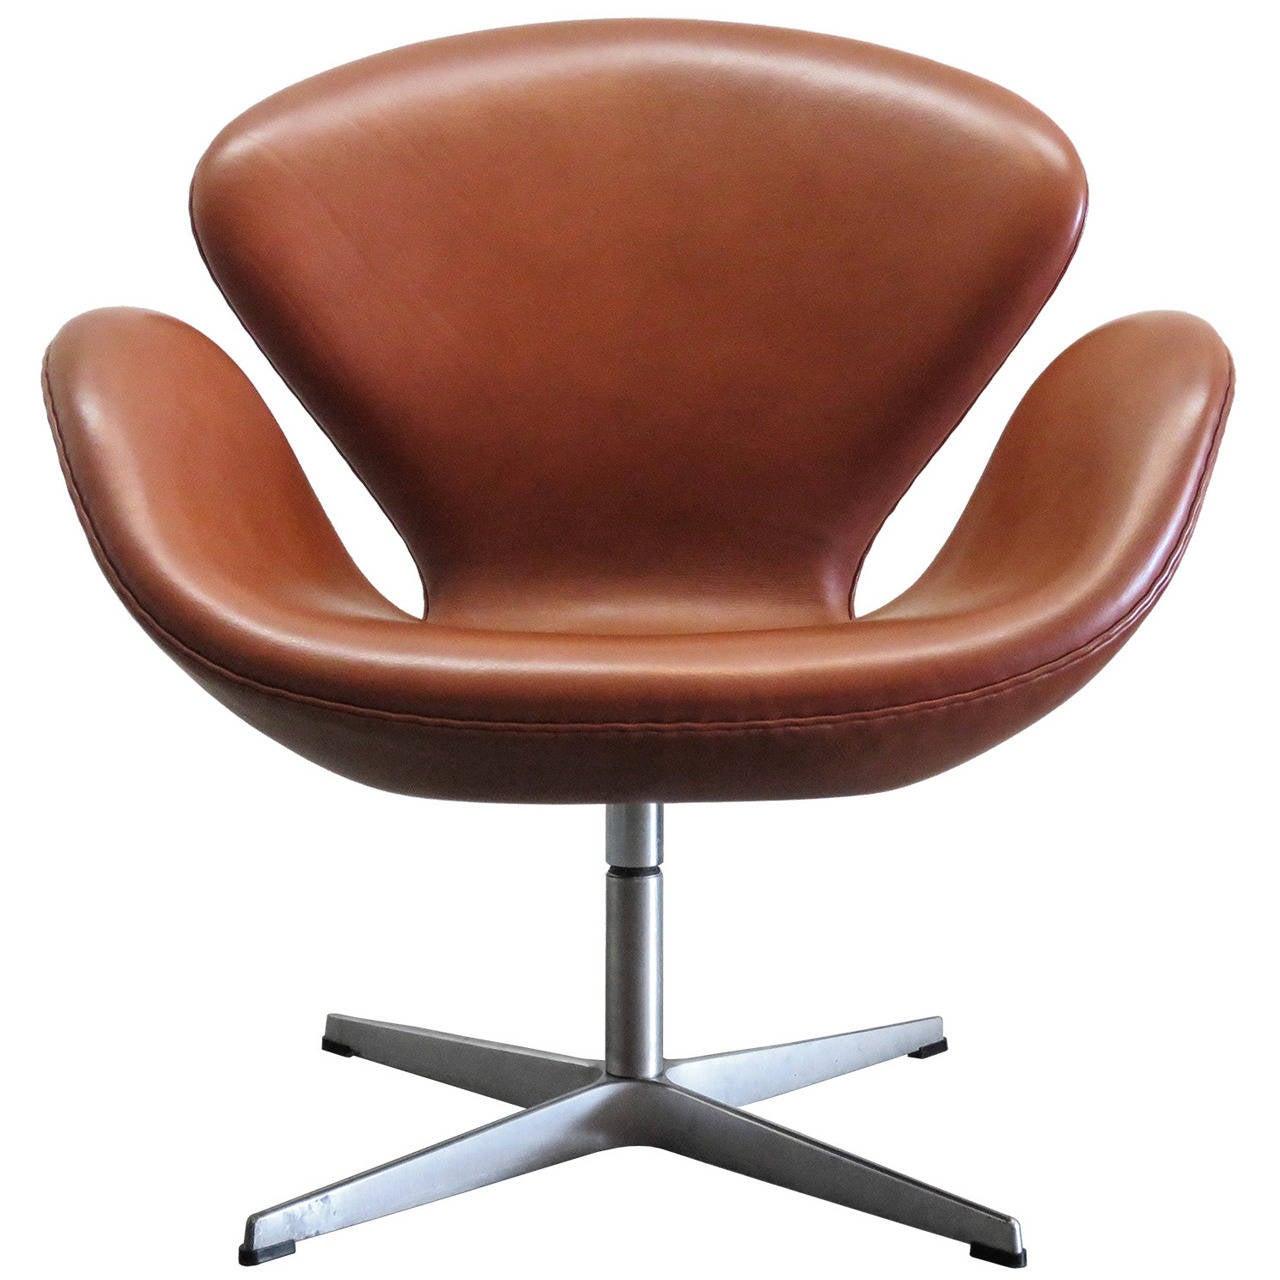 arne jacobsen swan chair big daddy adirondack set model 3320 at 1stdibs